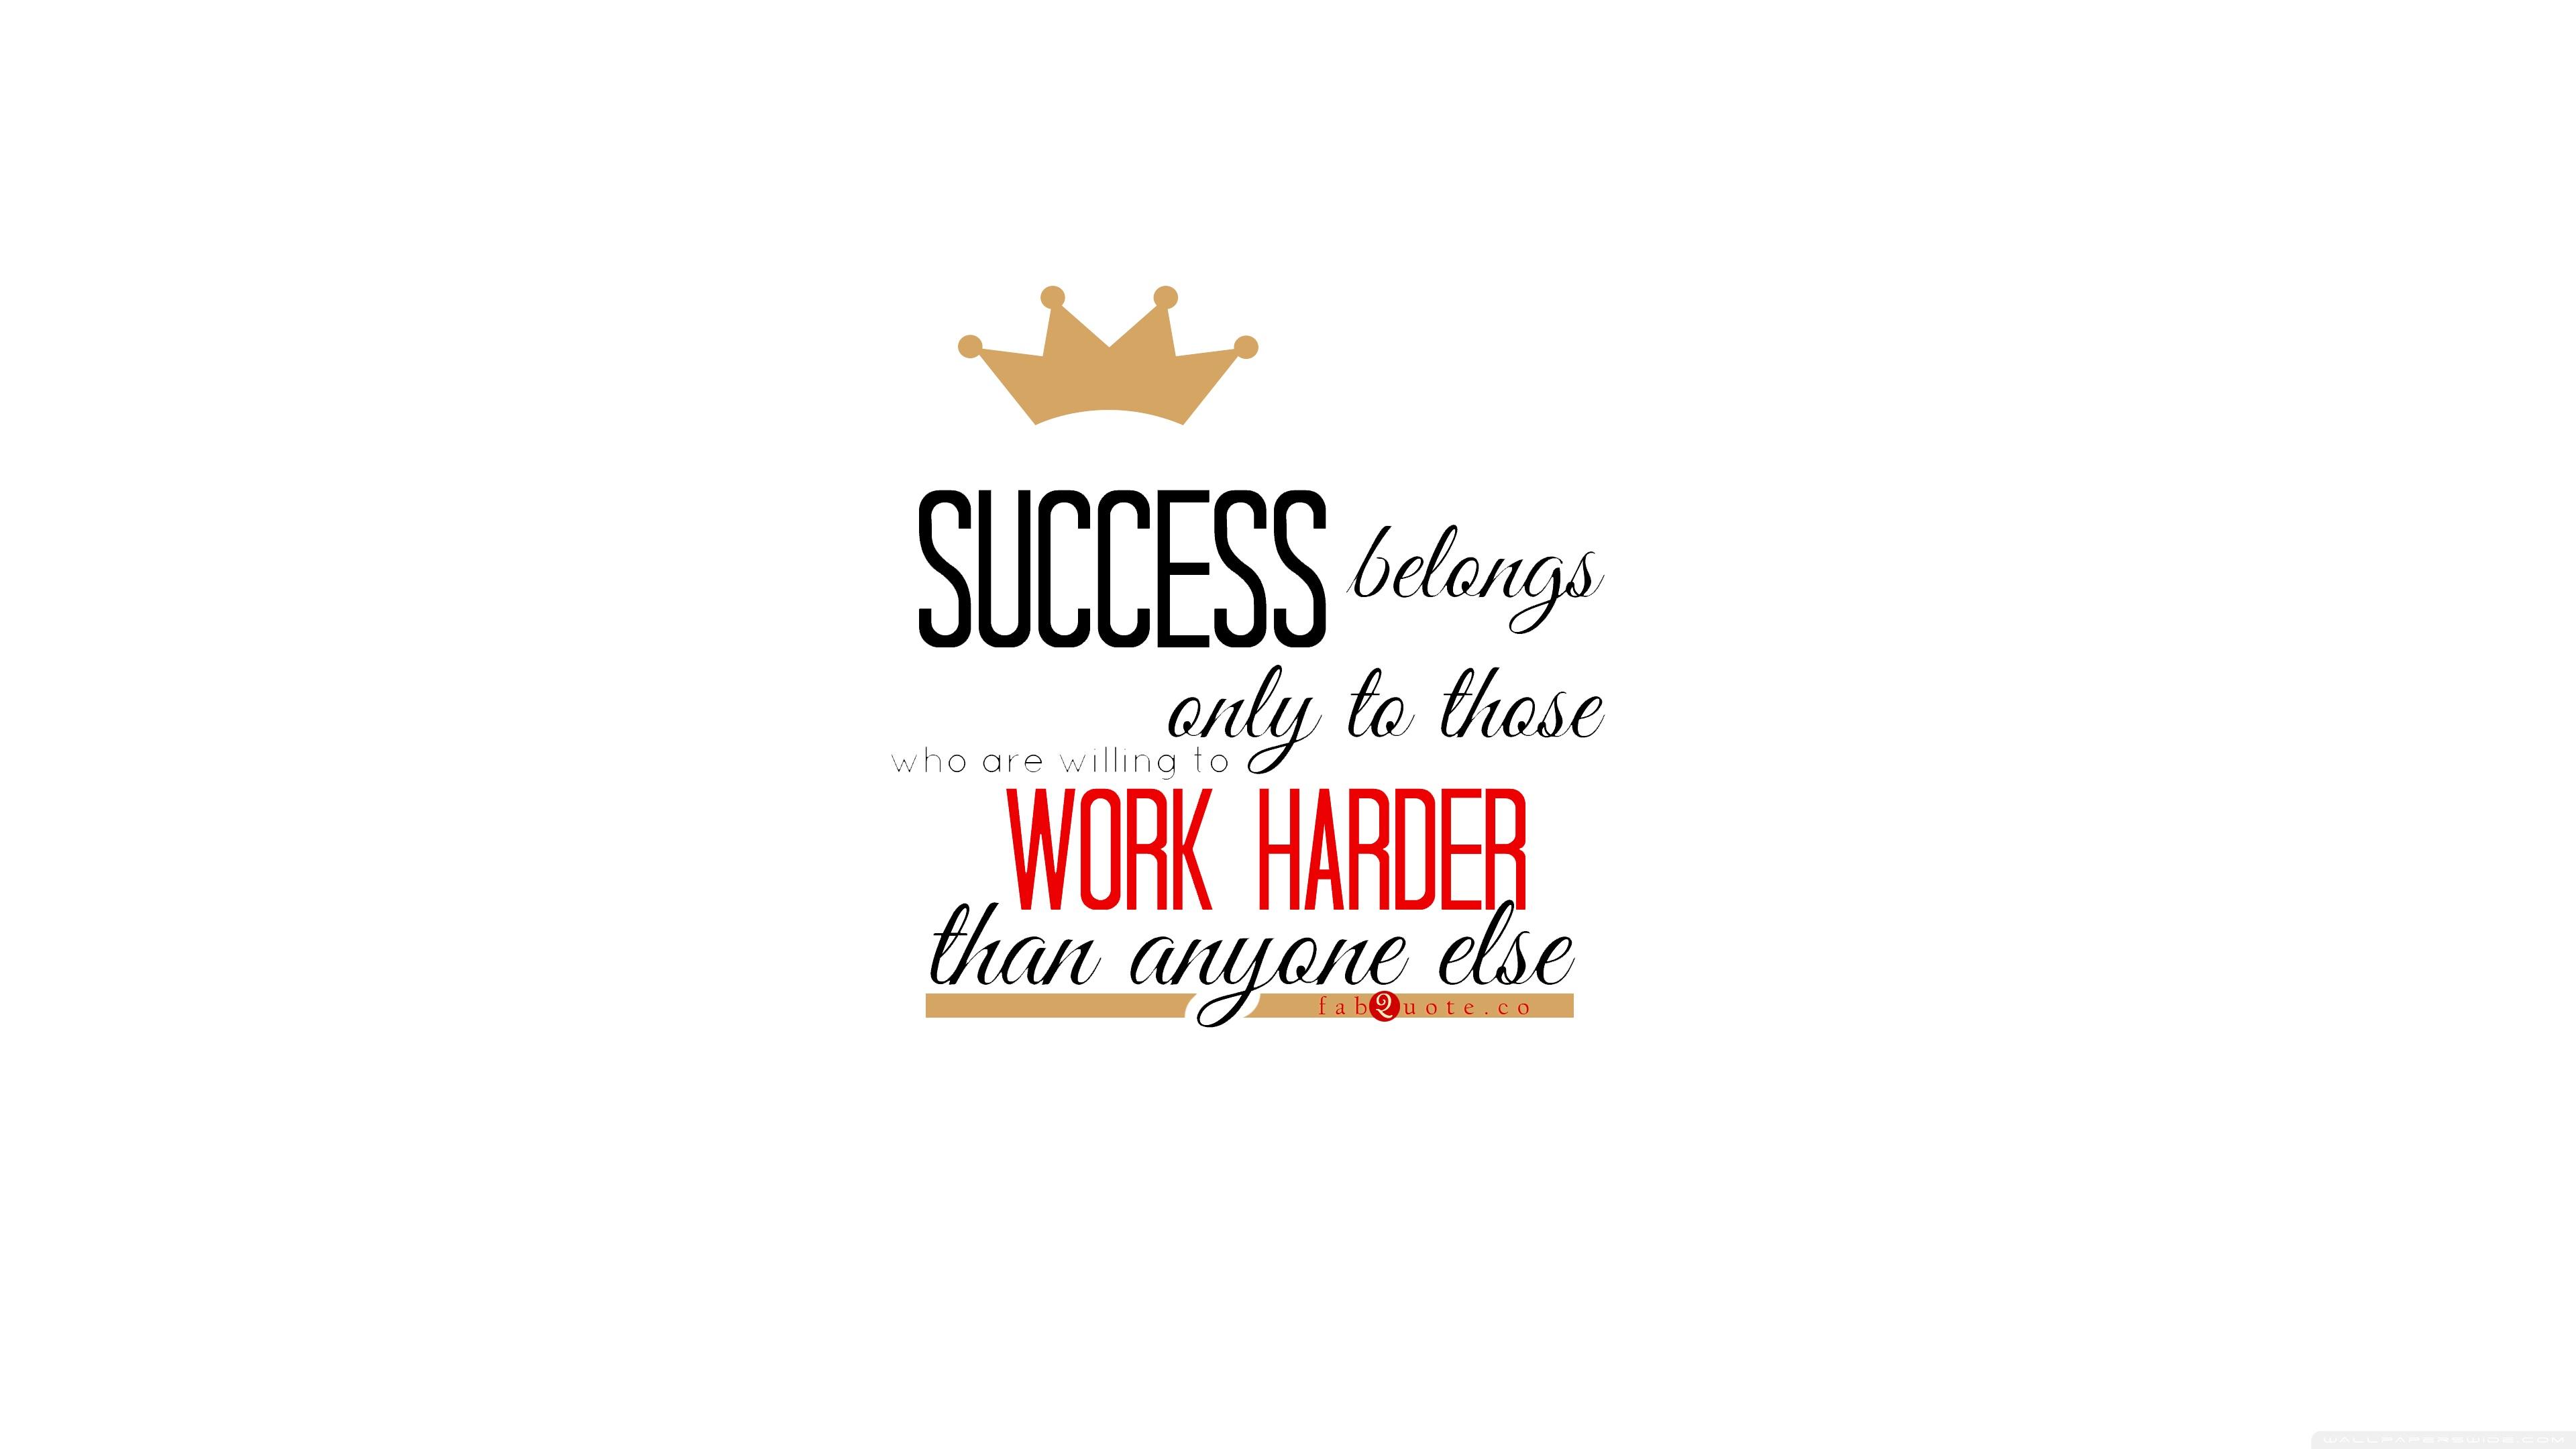 Rupi Kaur Quotes Wallpaper Quote About Success 4k Hd Desktop Wallpaper For 4k Ultra